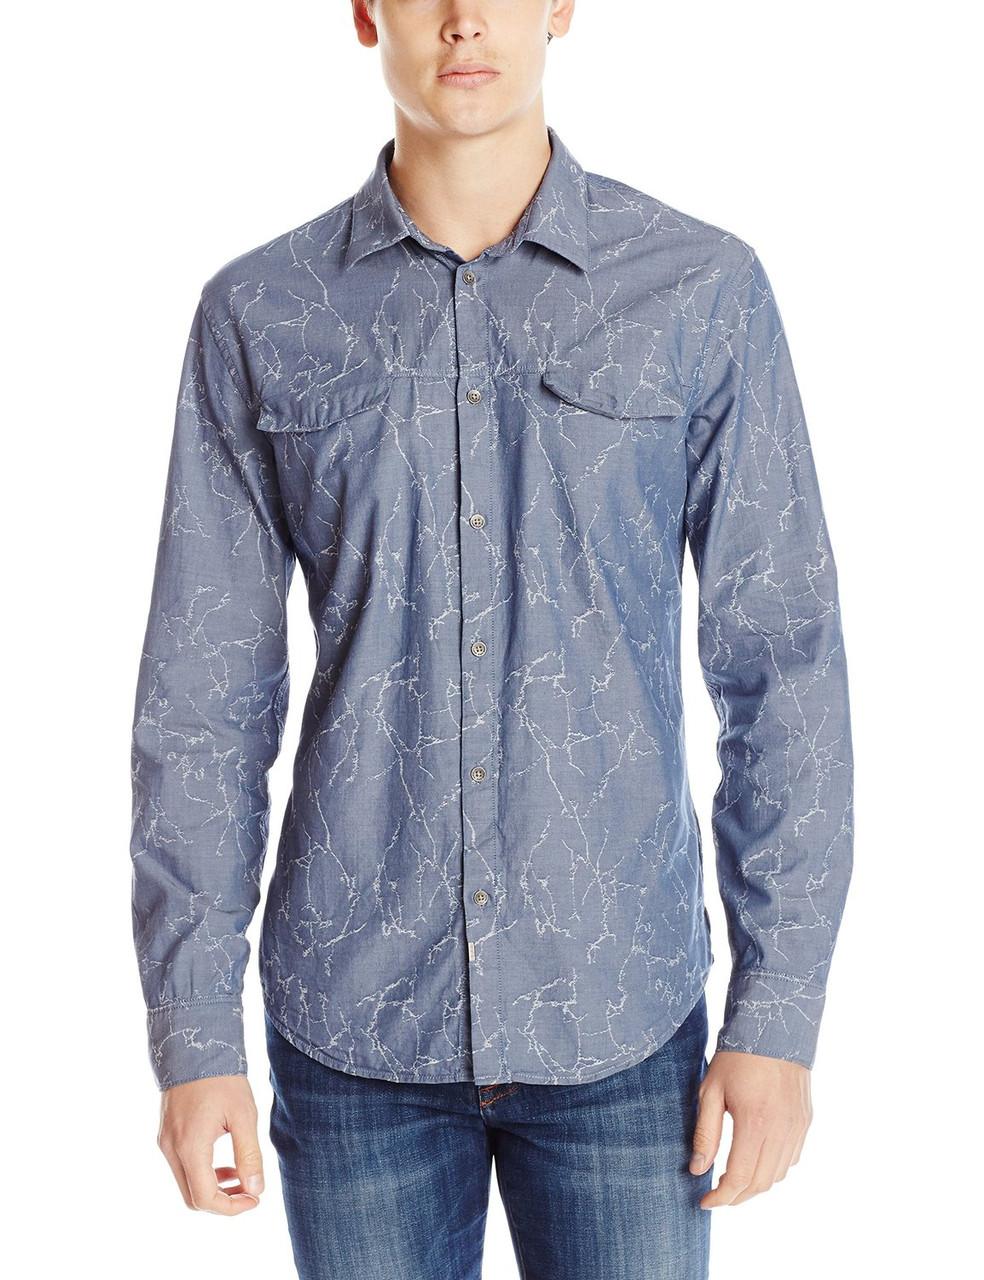 Рубашка Calvin Klein Jeans, XL, Washed Hazed, 41MW133-422, фото 1